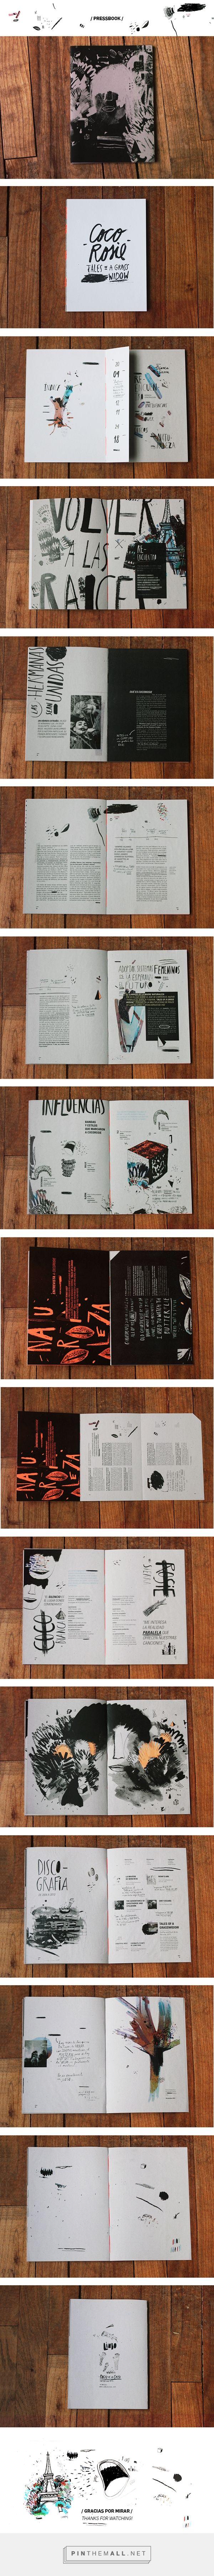 Pressbook / Recital CocoRosie on Behance...